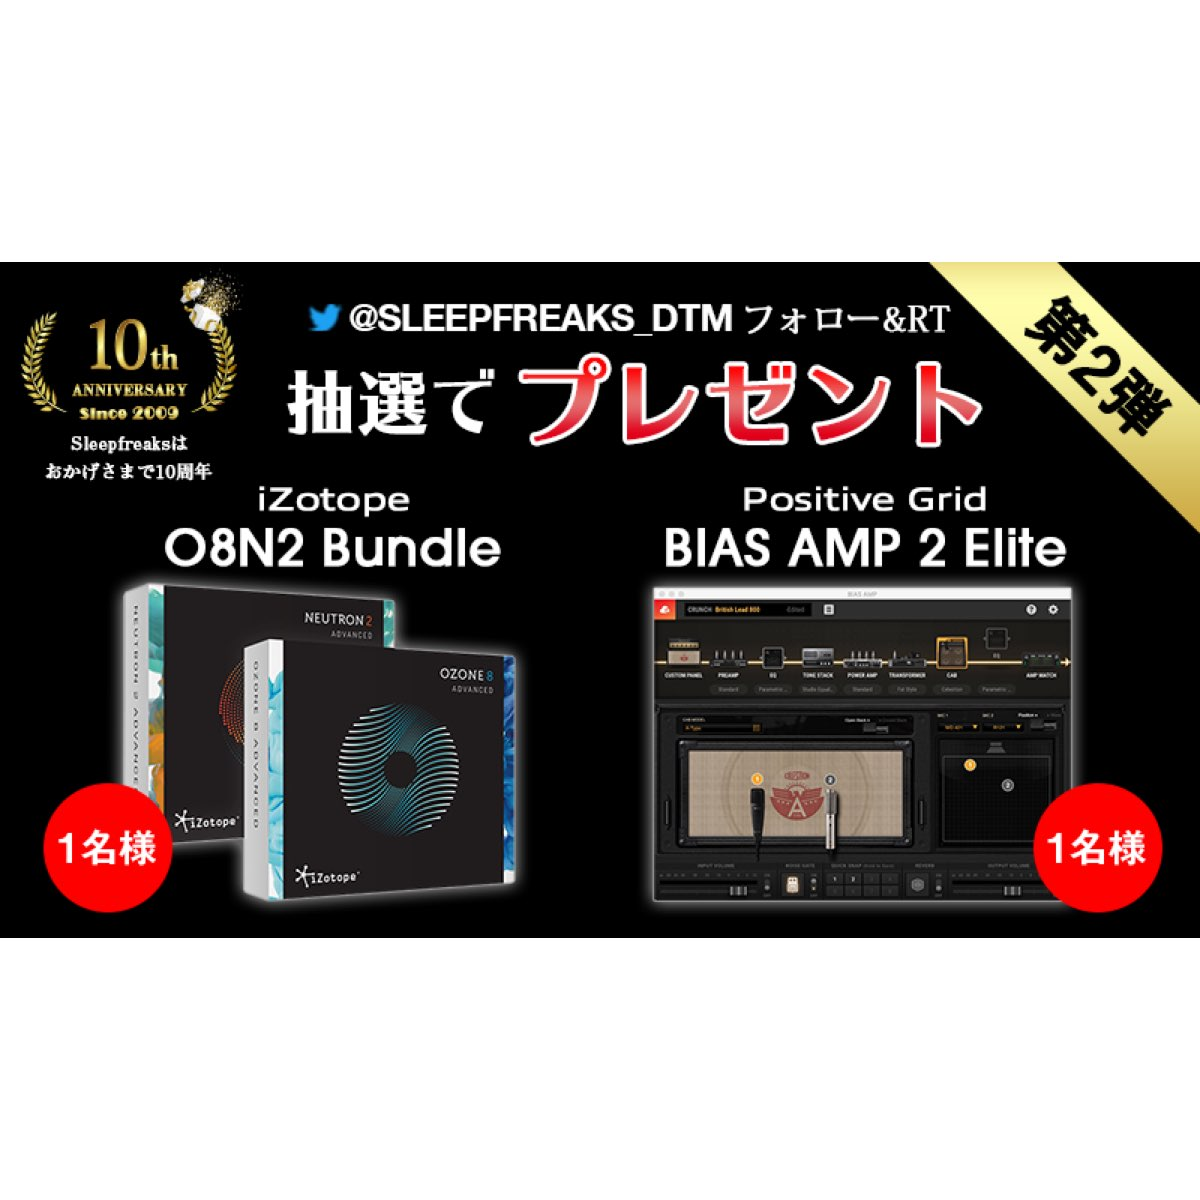 O8N2 Bundle、BIAS AMP 2 Eliteを抽選でプレゼント!Sleepfreaks 10th Anniversary キャンペーン 第2弾